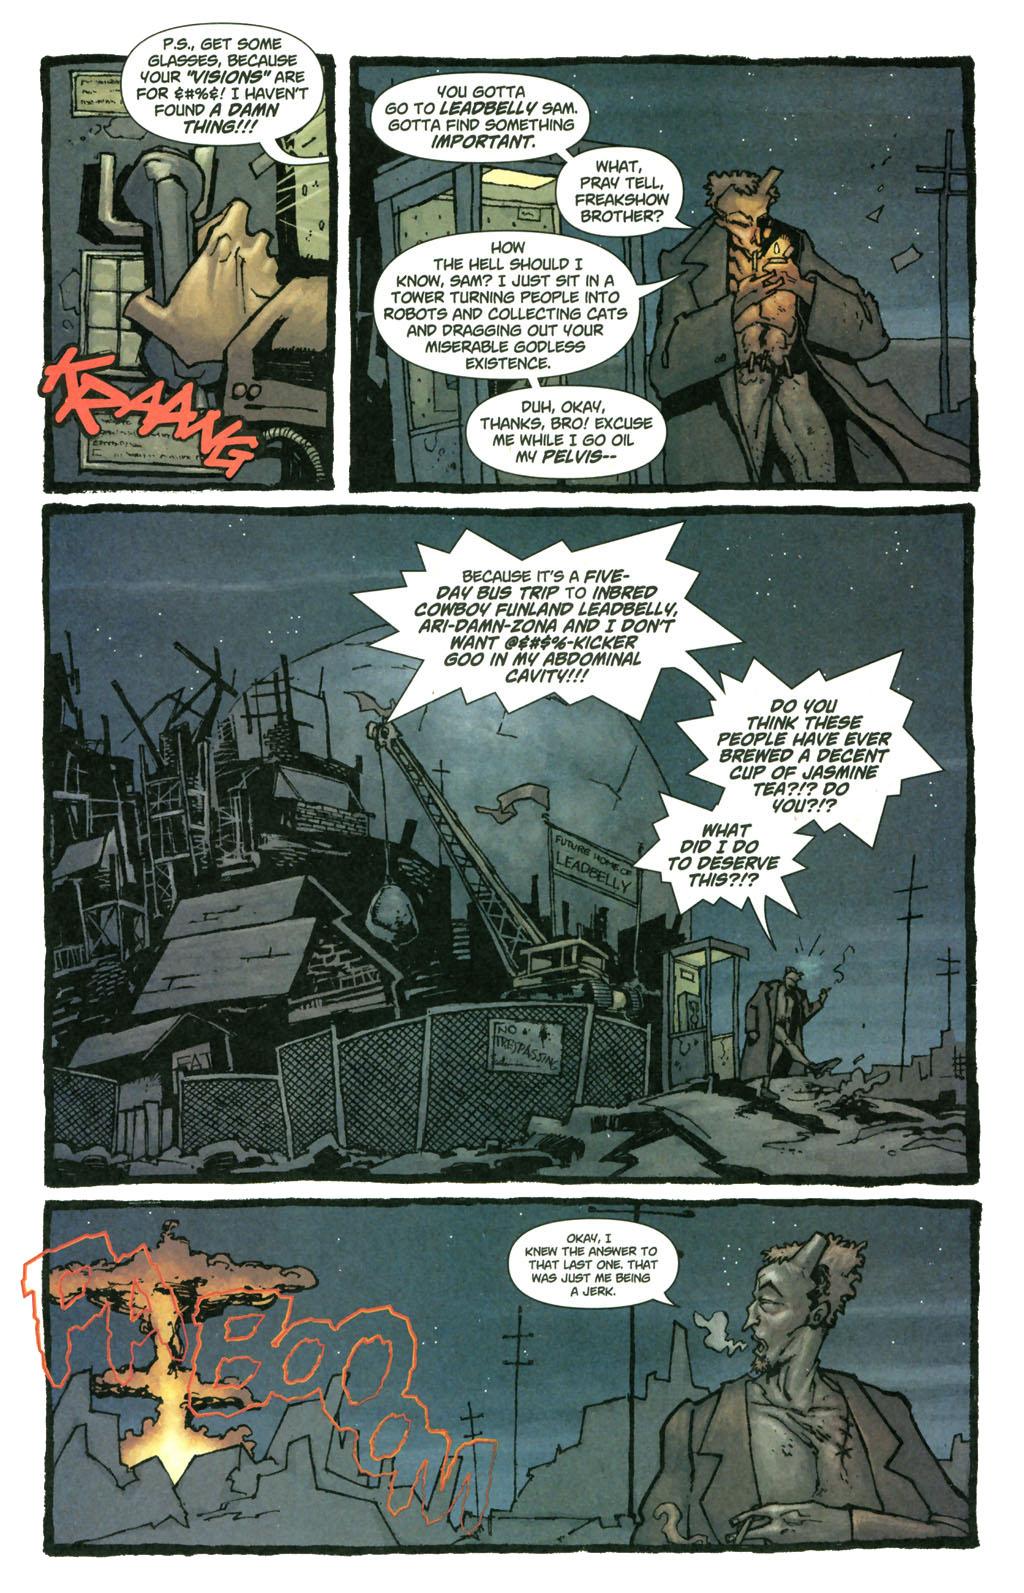 Read online Enginehead comic -  Issue #4 - 8